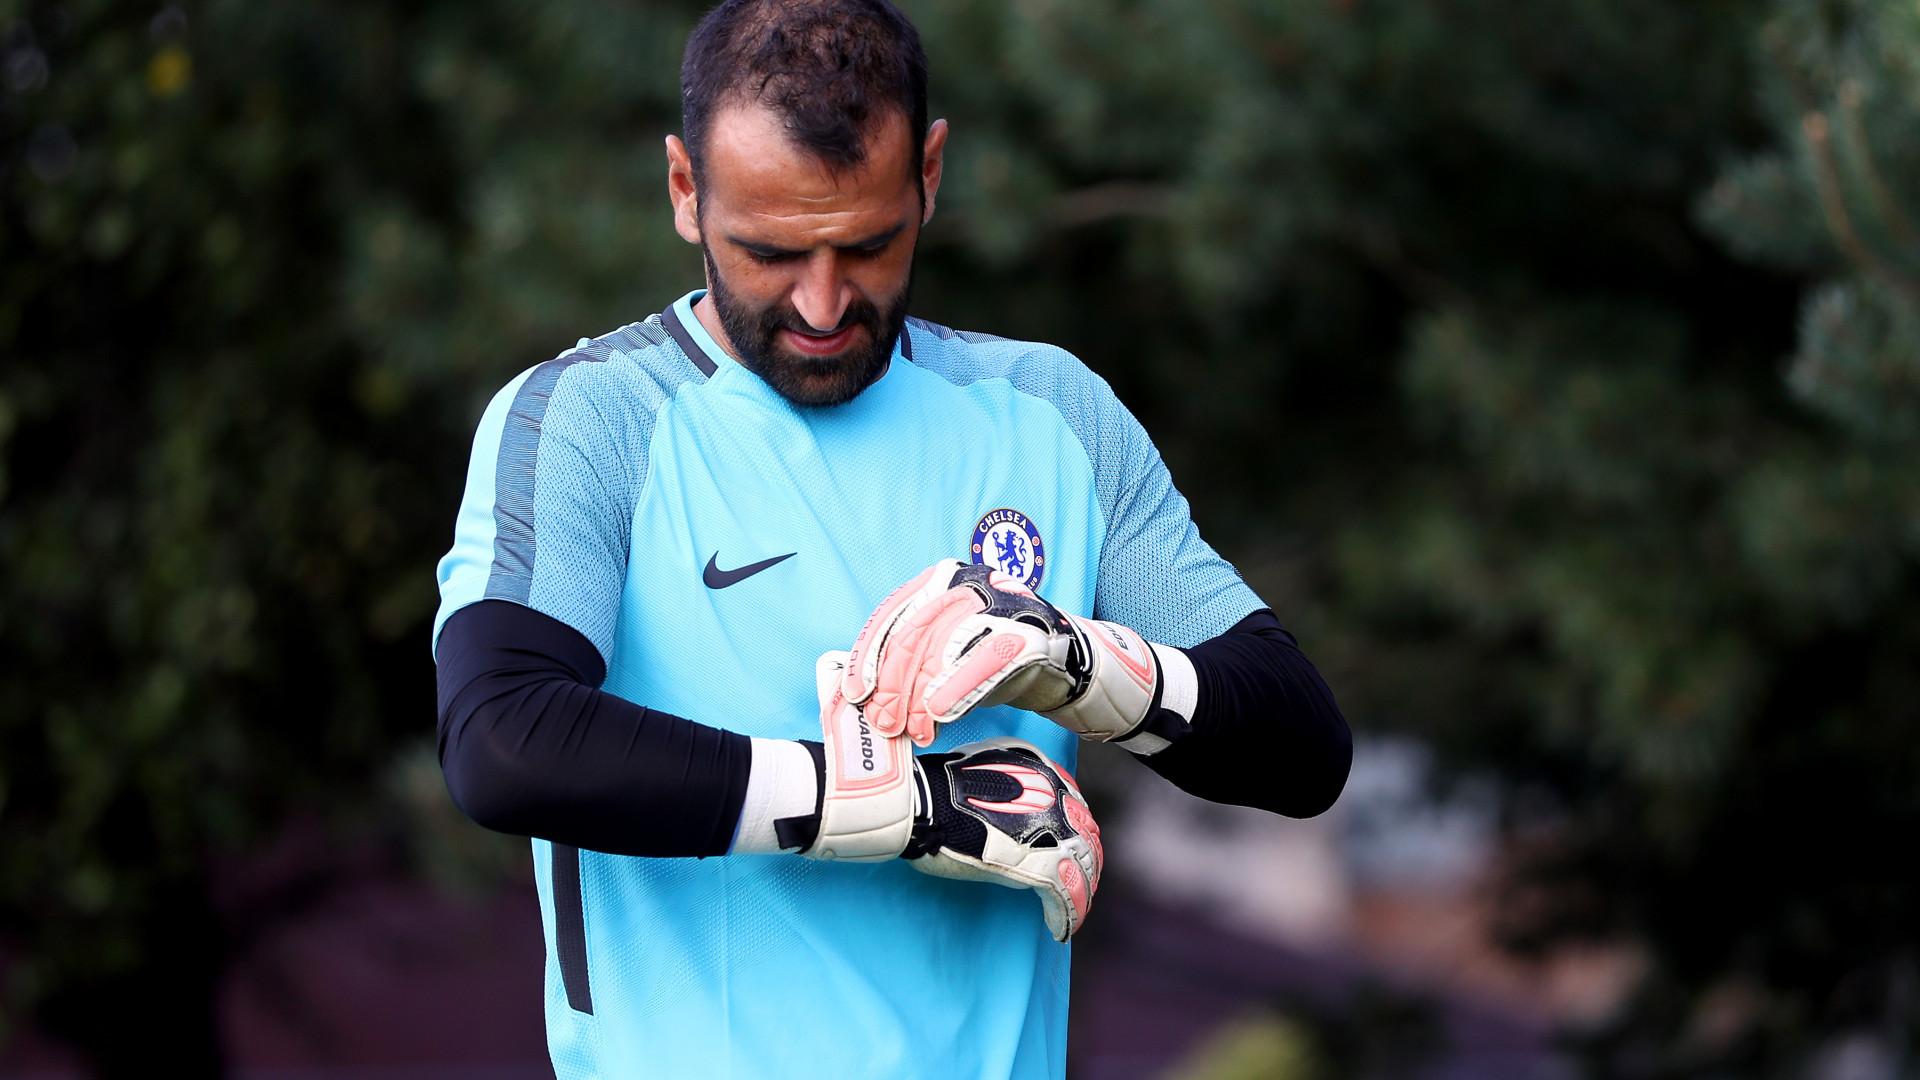 Chelsea dá 'guia de marcha' a nove jogadores. Eduardo incluído